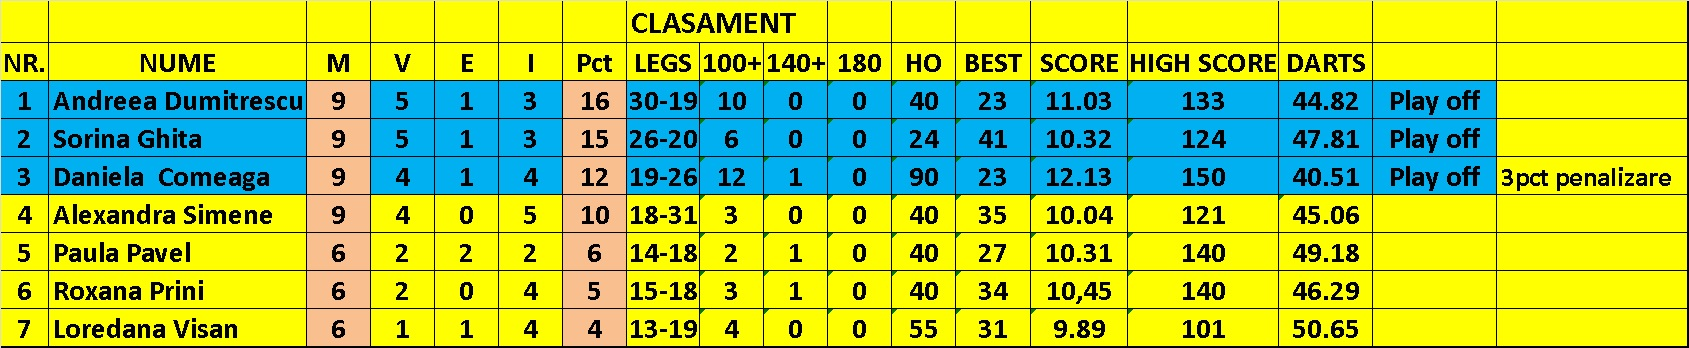 CLASAMENT Fete-final1